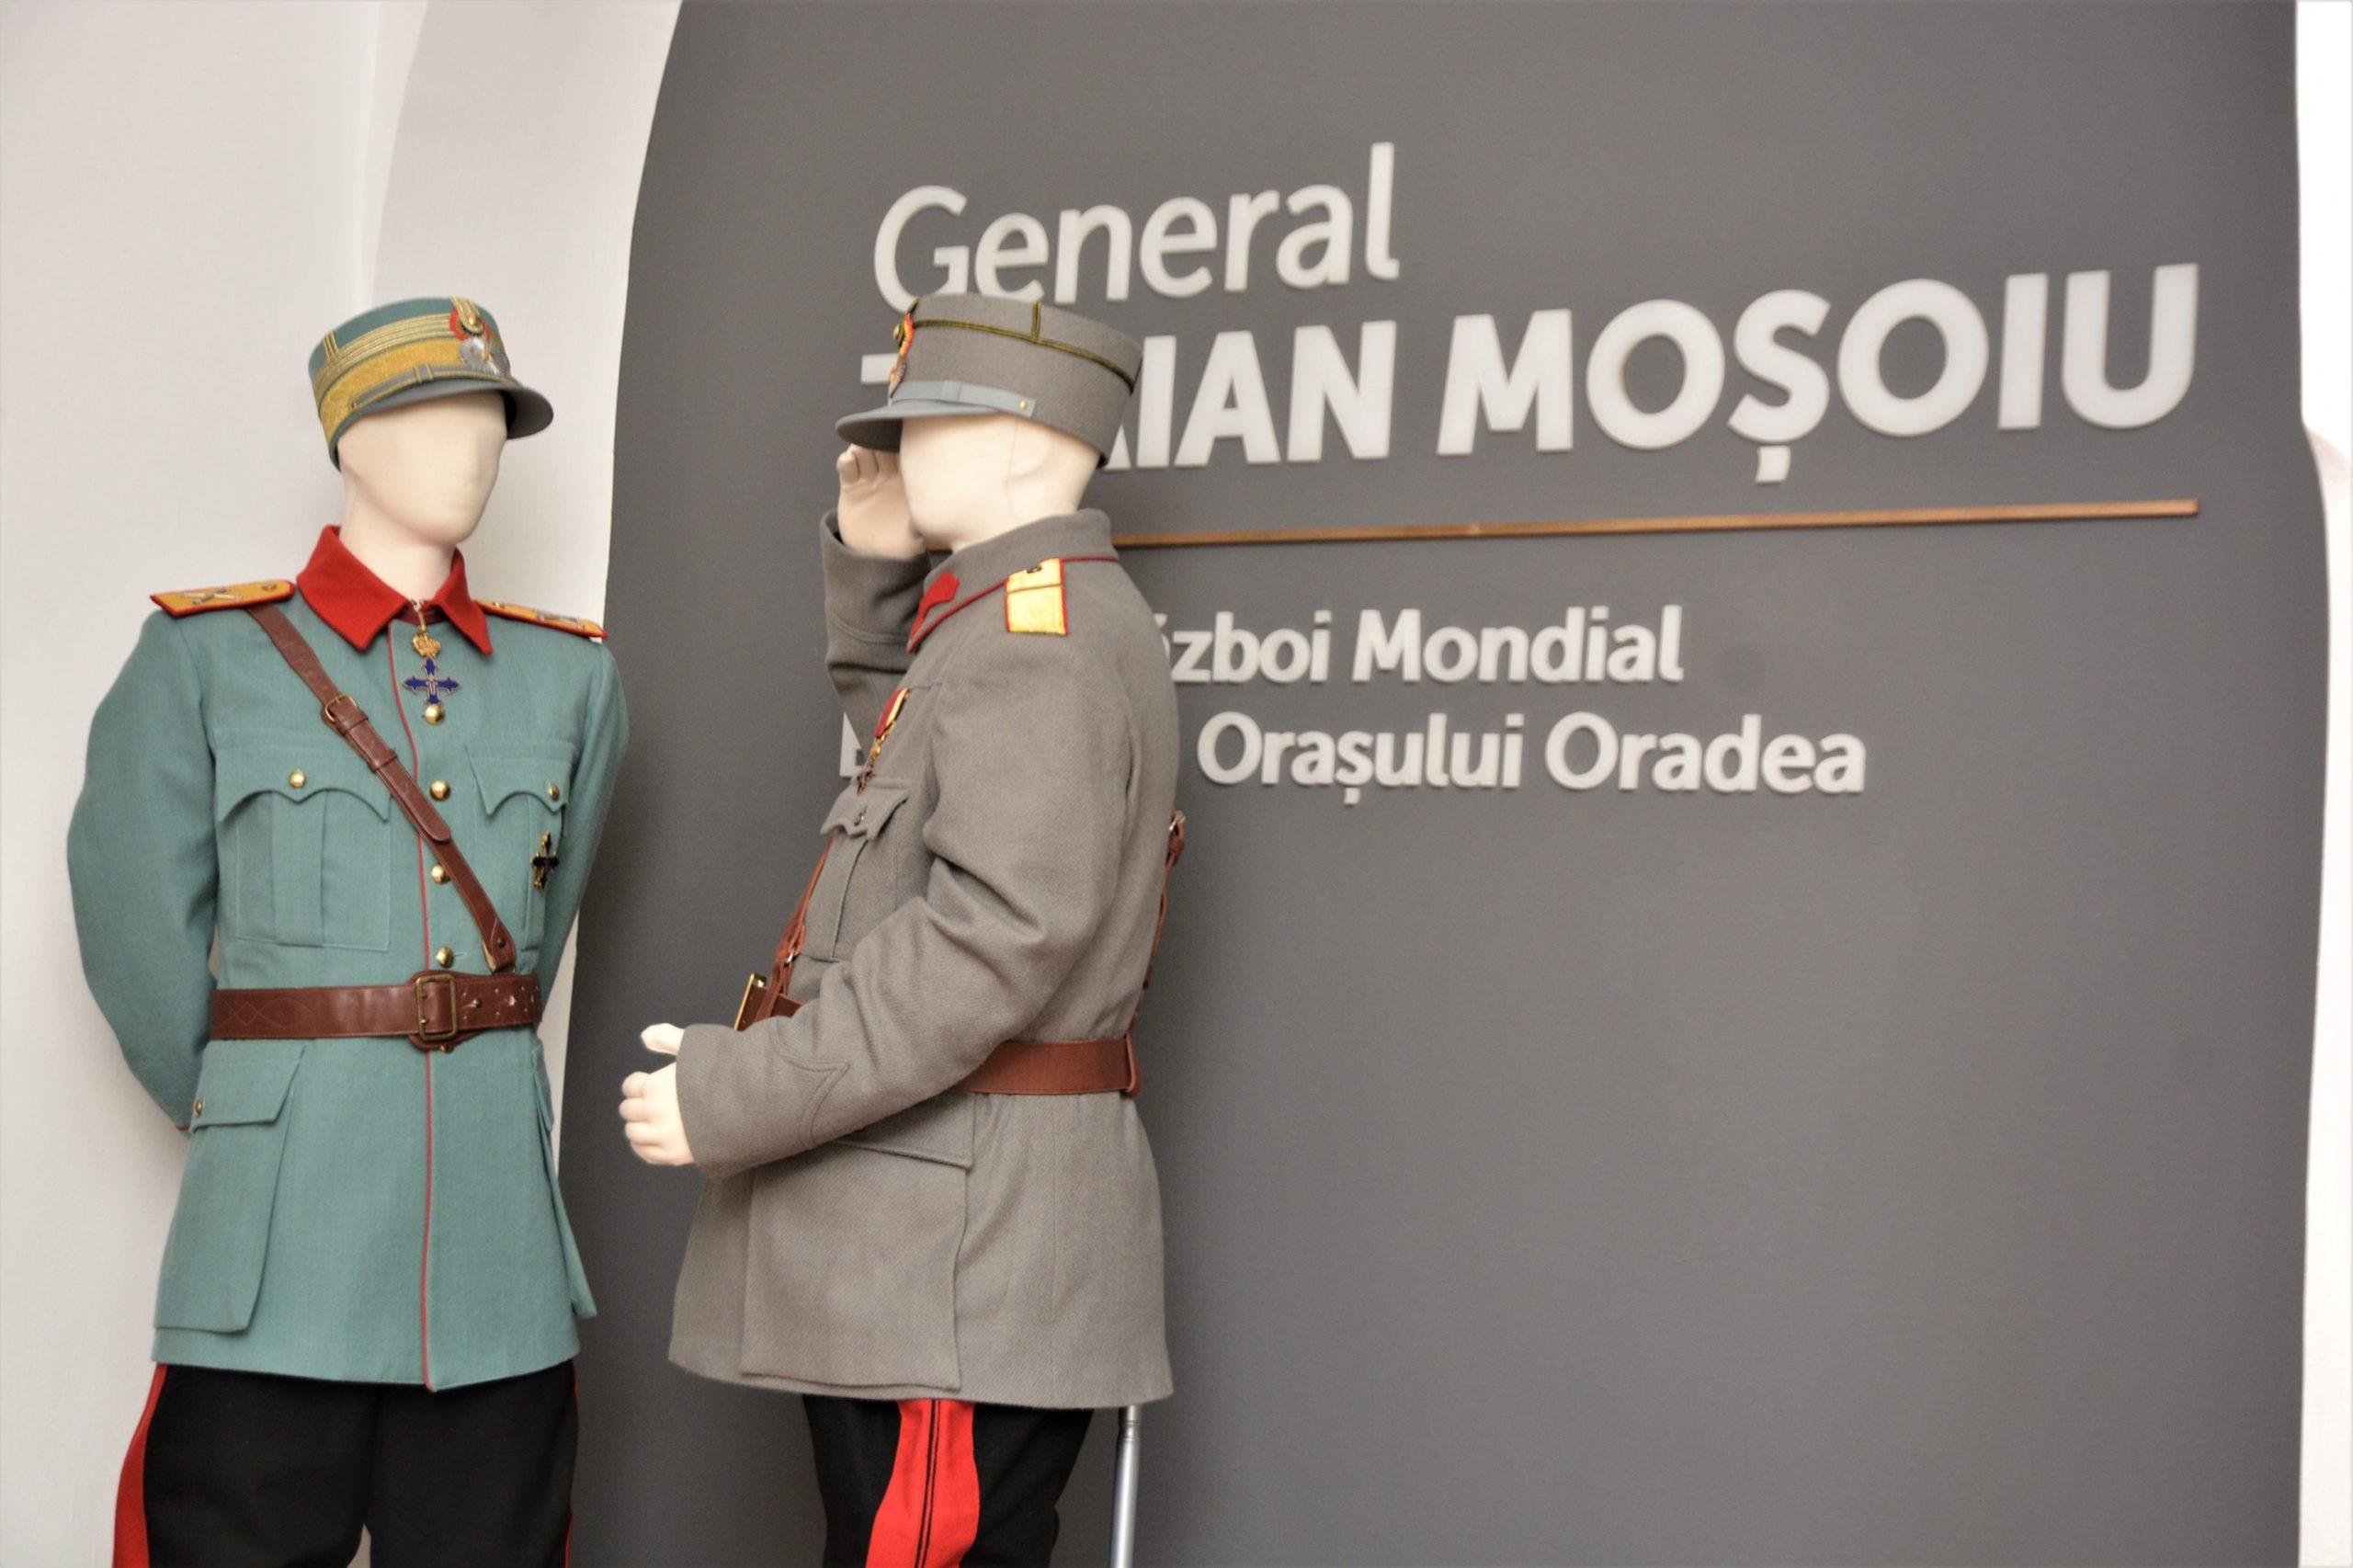 FOTO: Expoziție Traian Moșoiu 19.04.2021